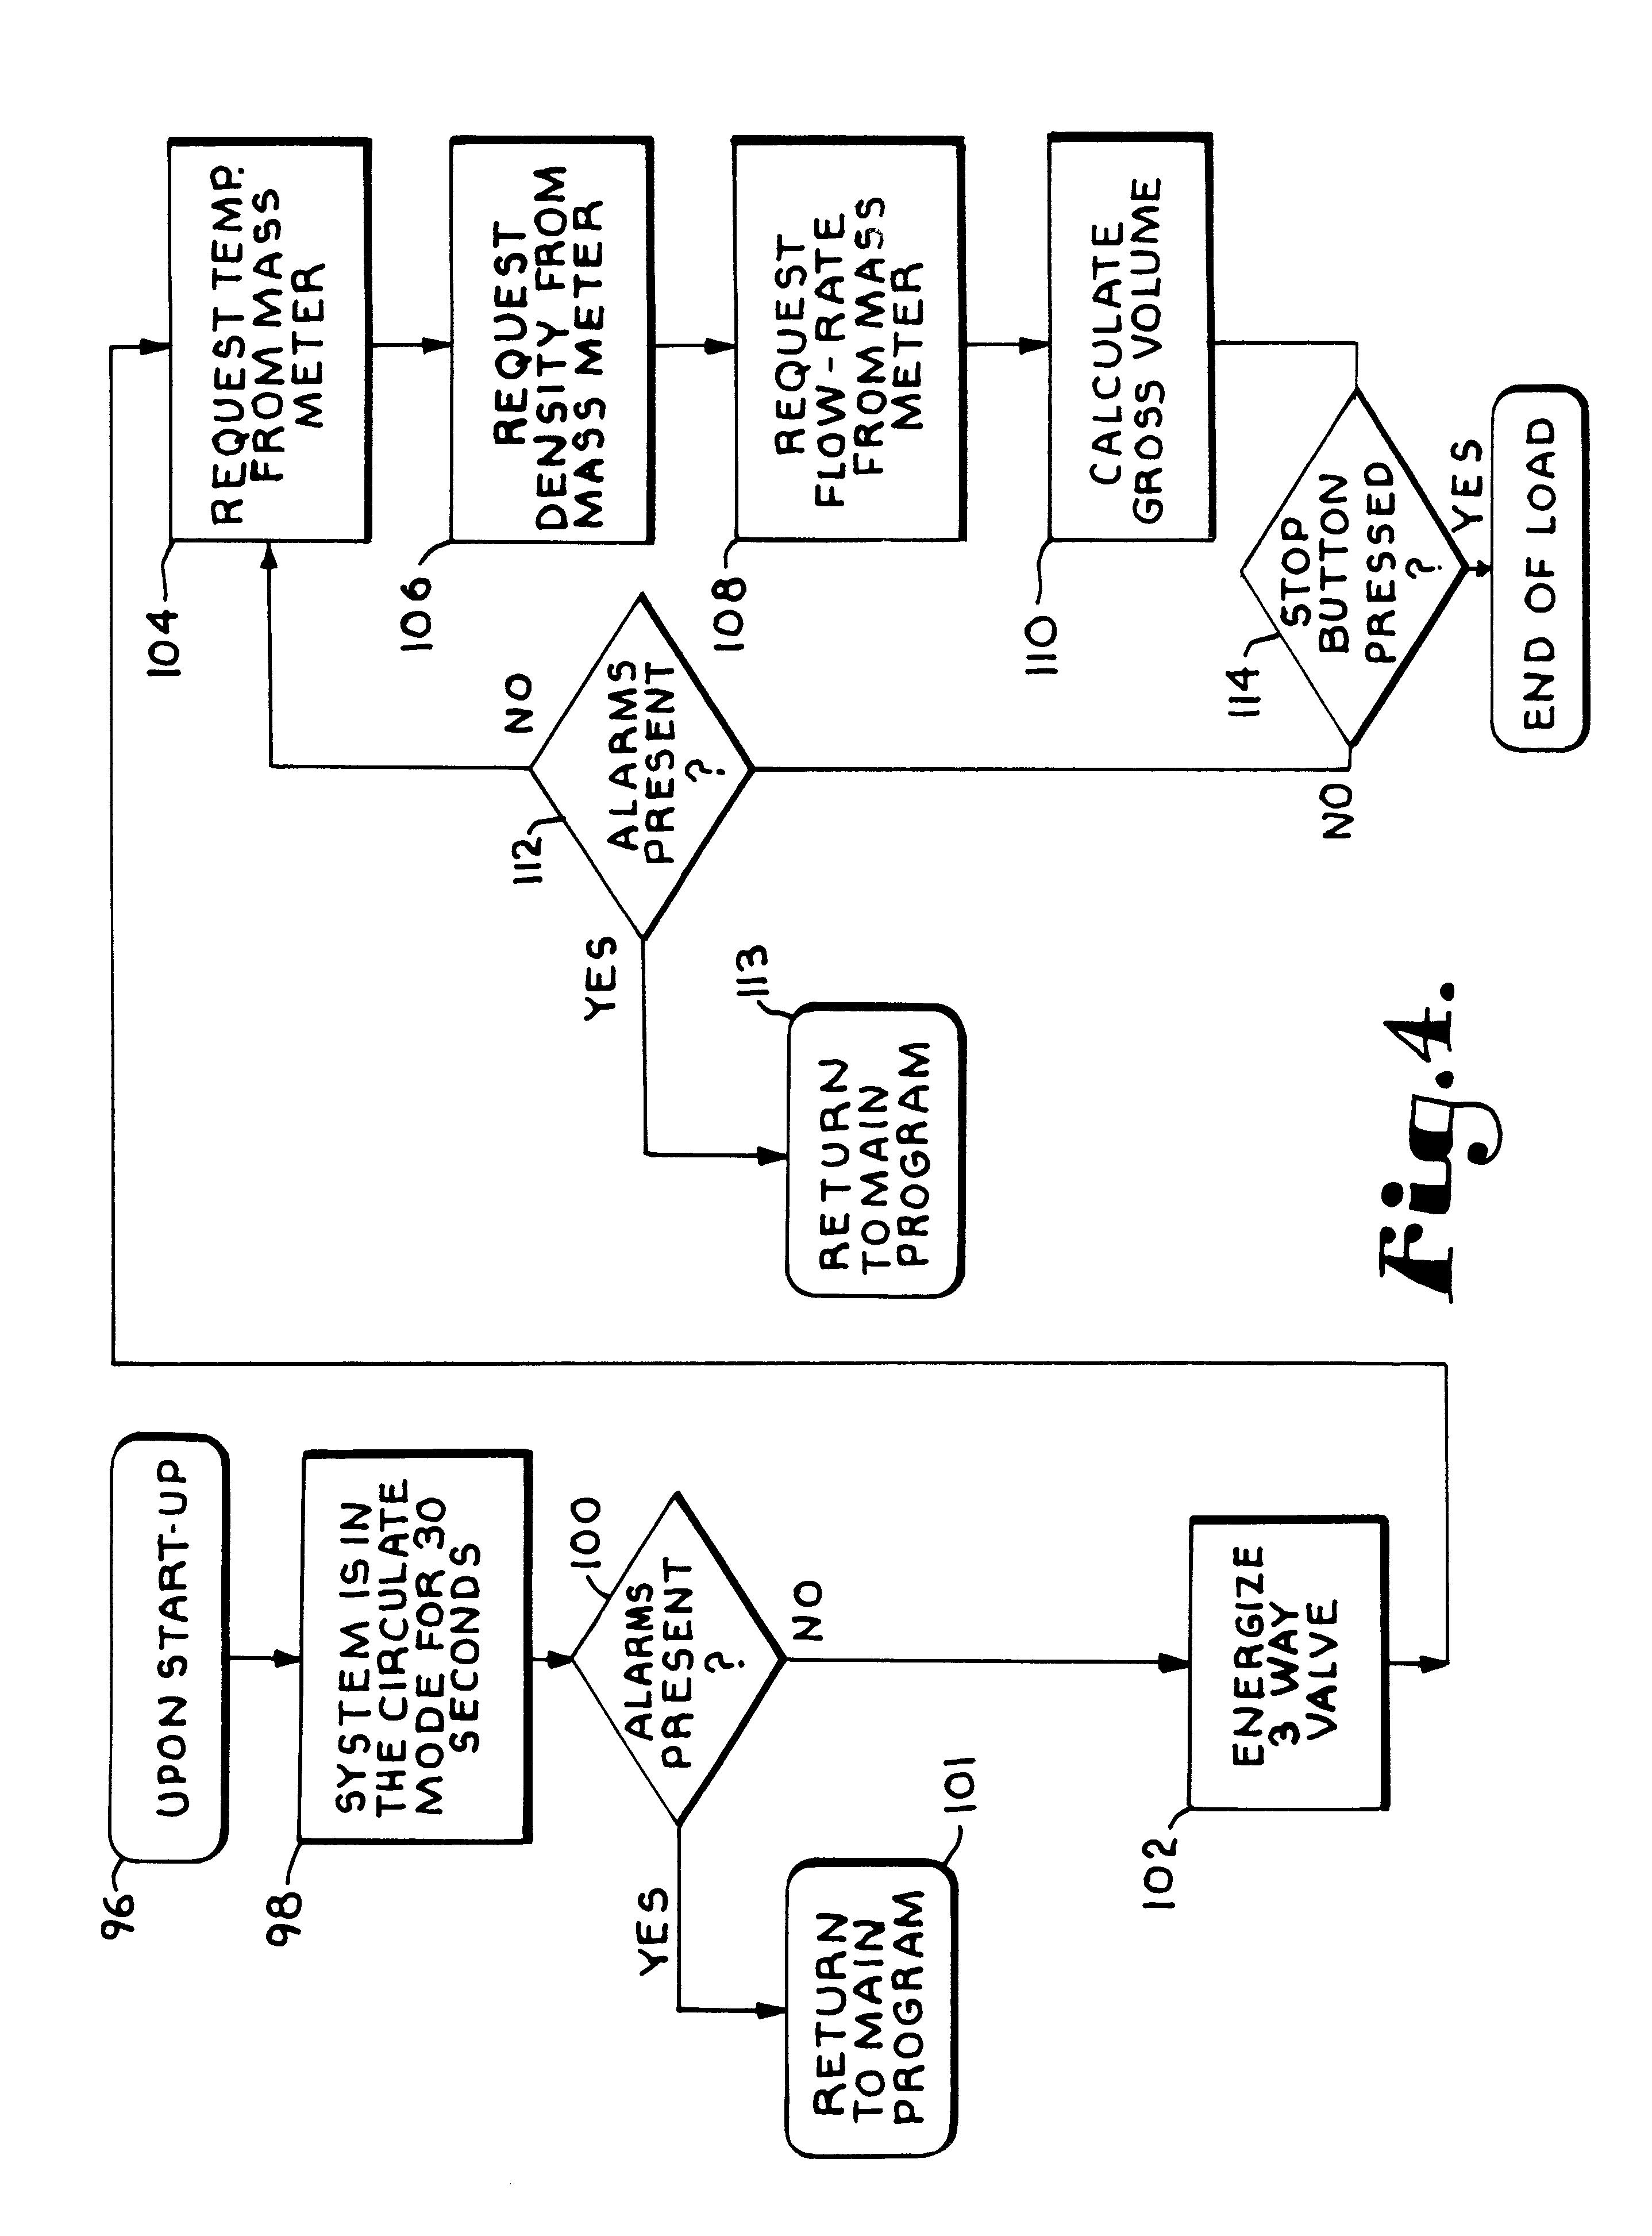 Brevet US6178810 - Crude oil measurement system and method